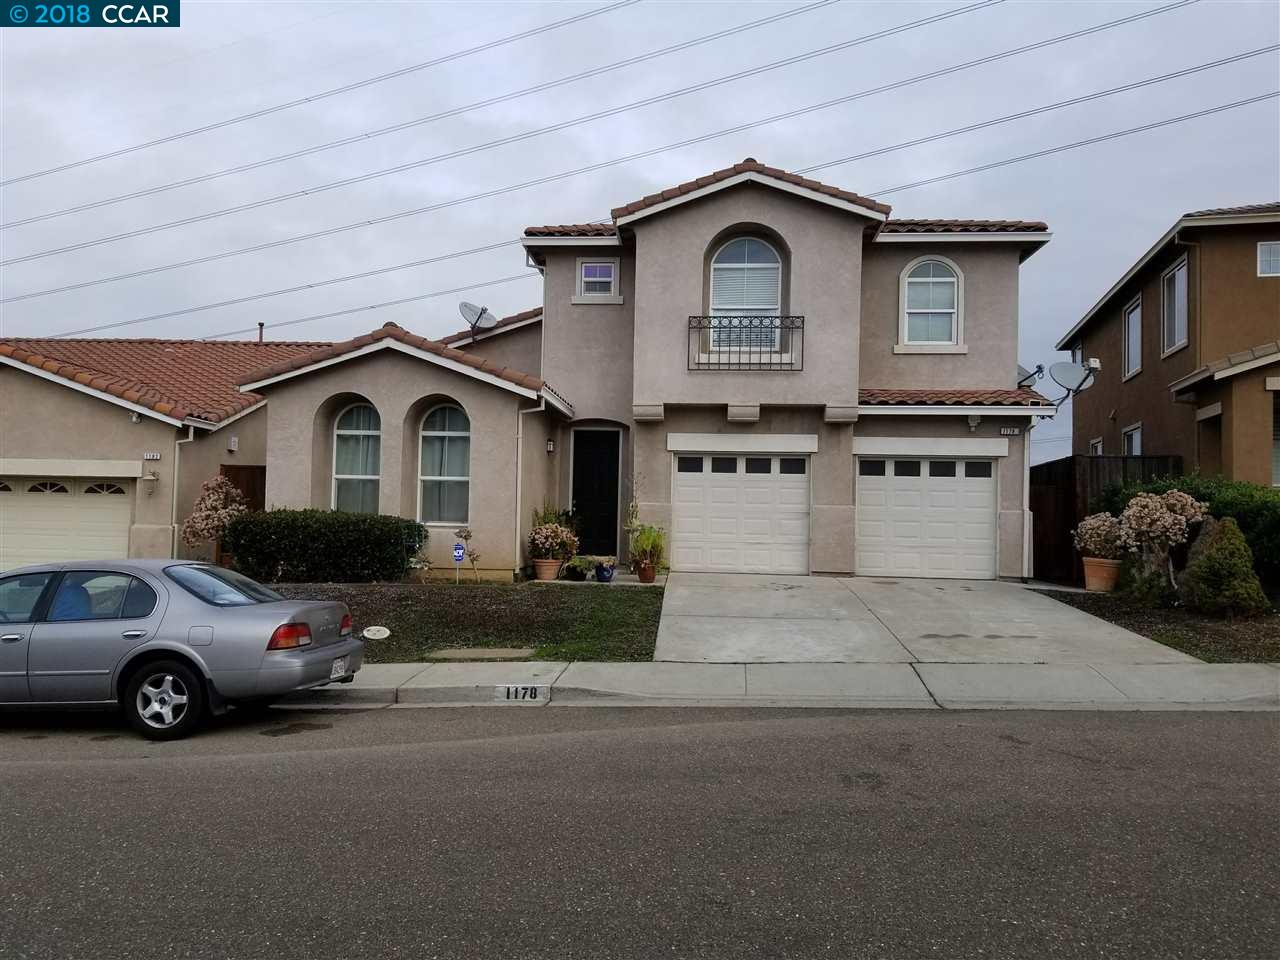 واحد منزل الأسرة للـ Sale في 1178 Santa Lucia Drive 1178 Santa Lucia Drive Pittsburg, California 94565 United States